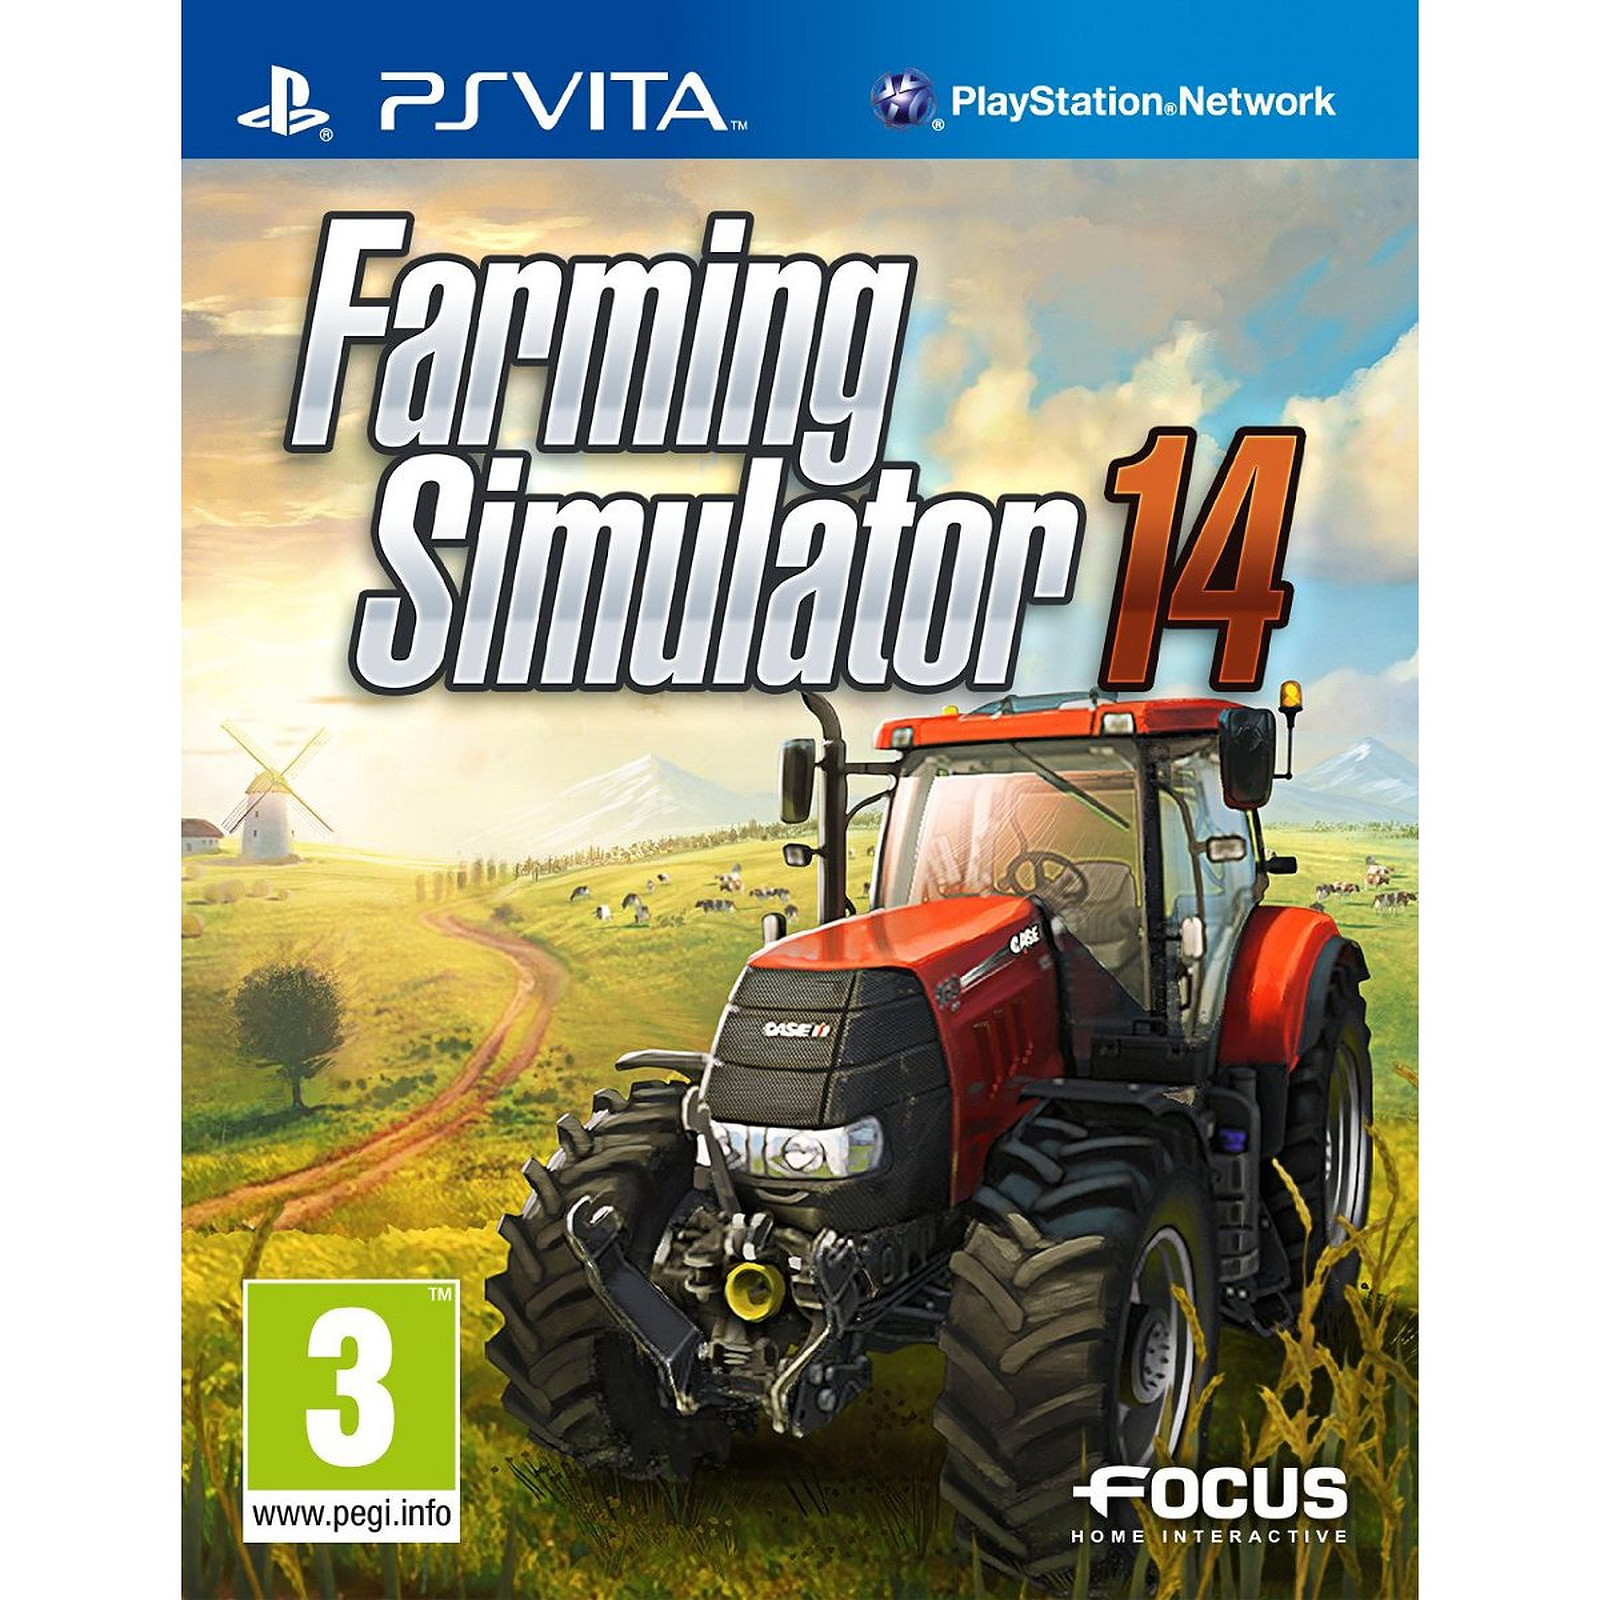 Farming Simulator 14 PS Vita